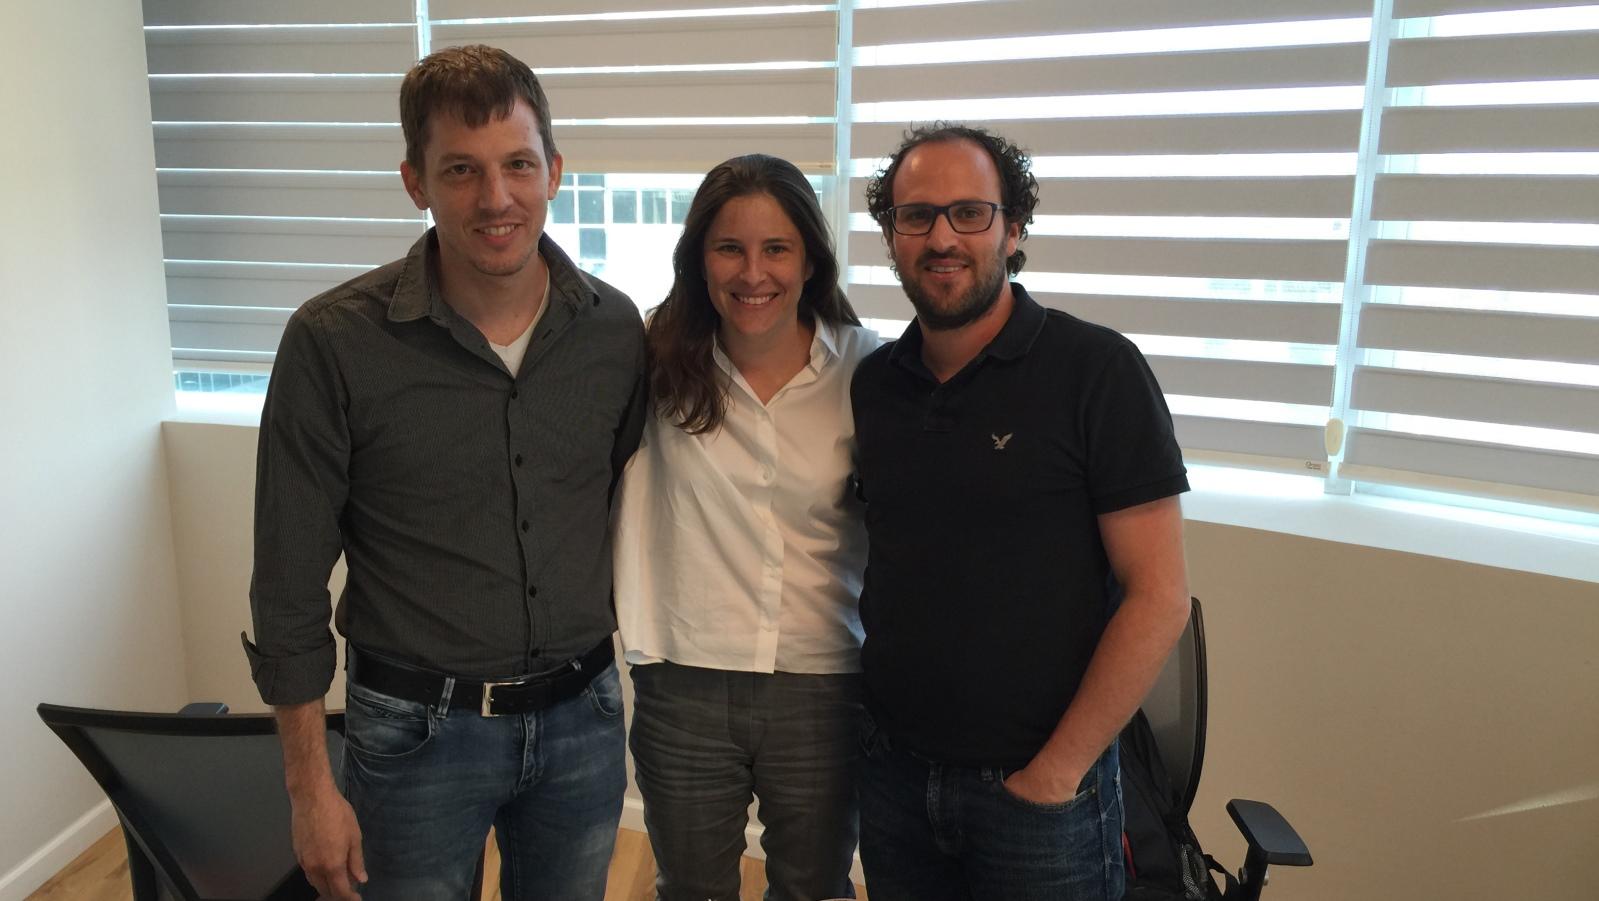 From left, MyndYou cofounders Itay Baruchi, Ruth Poliakine Baruchi and Dan Sztybel. Photo: courtesy